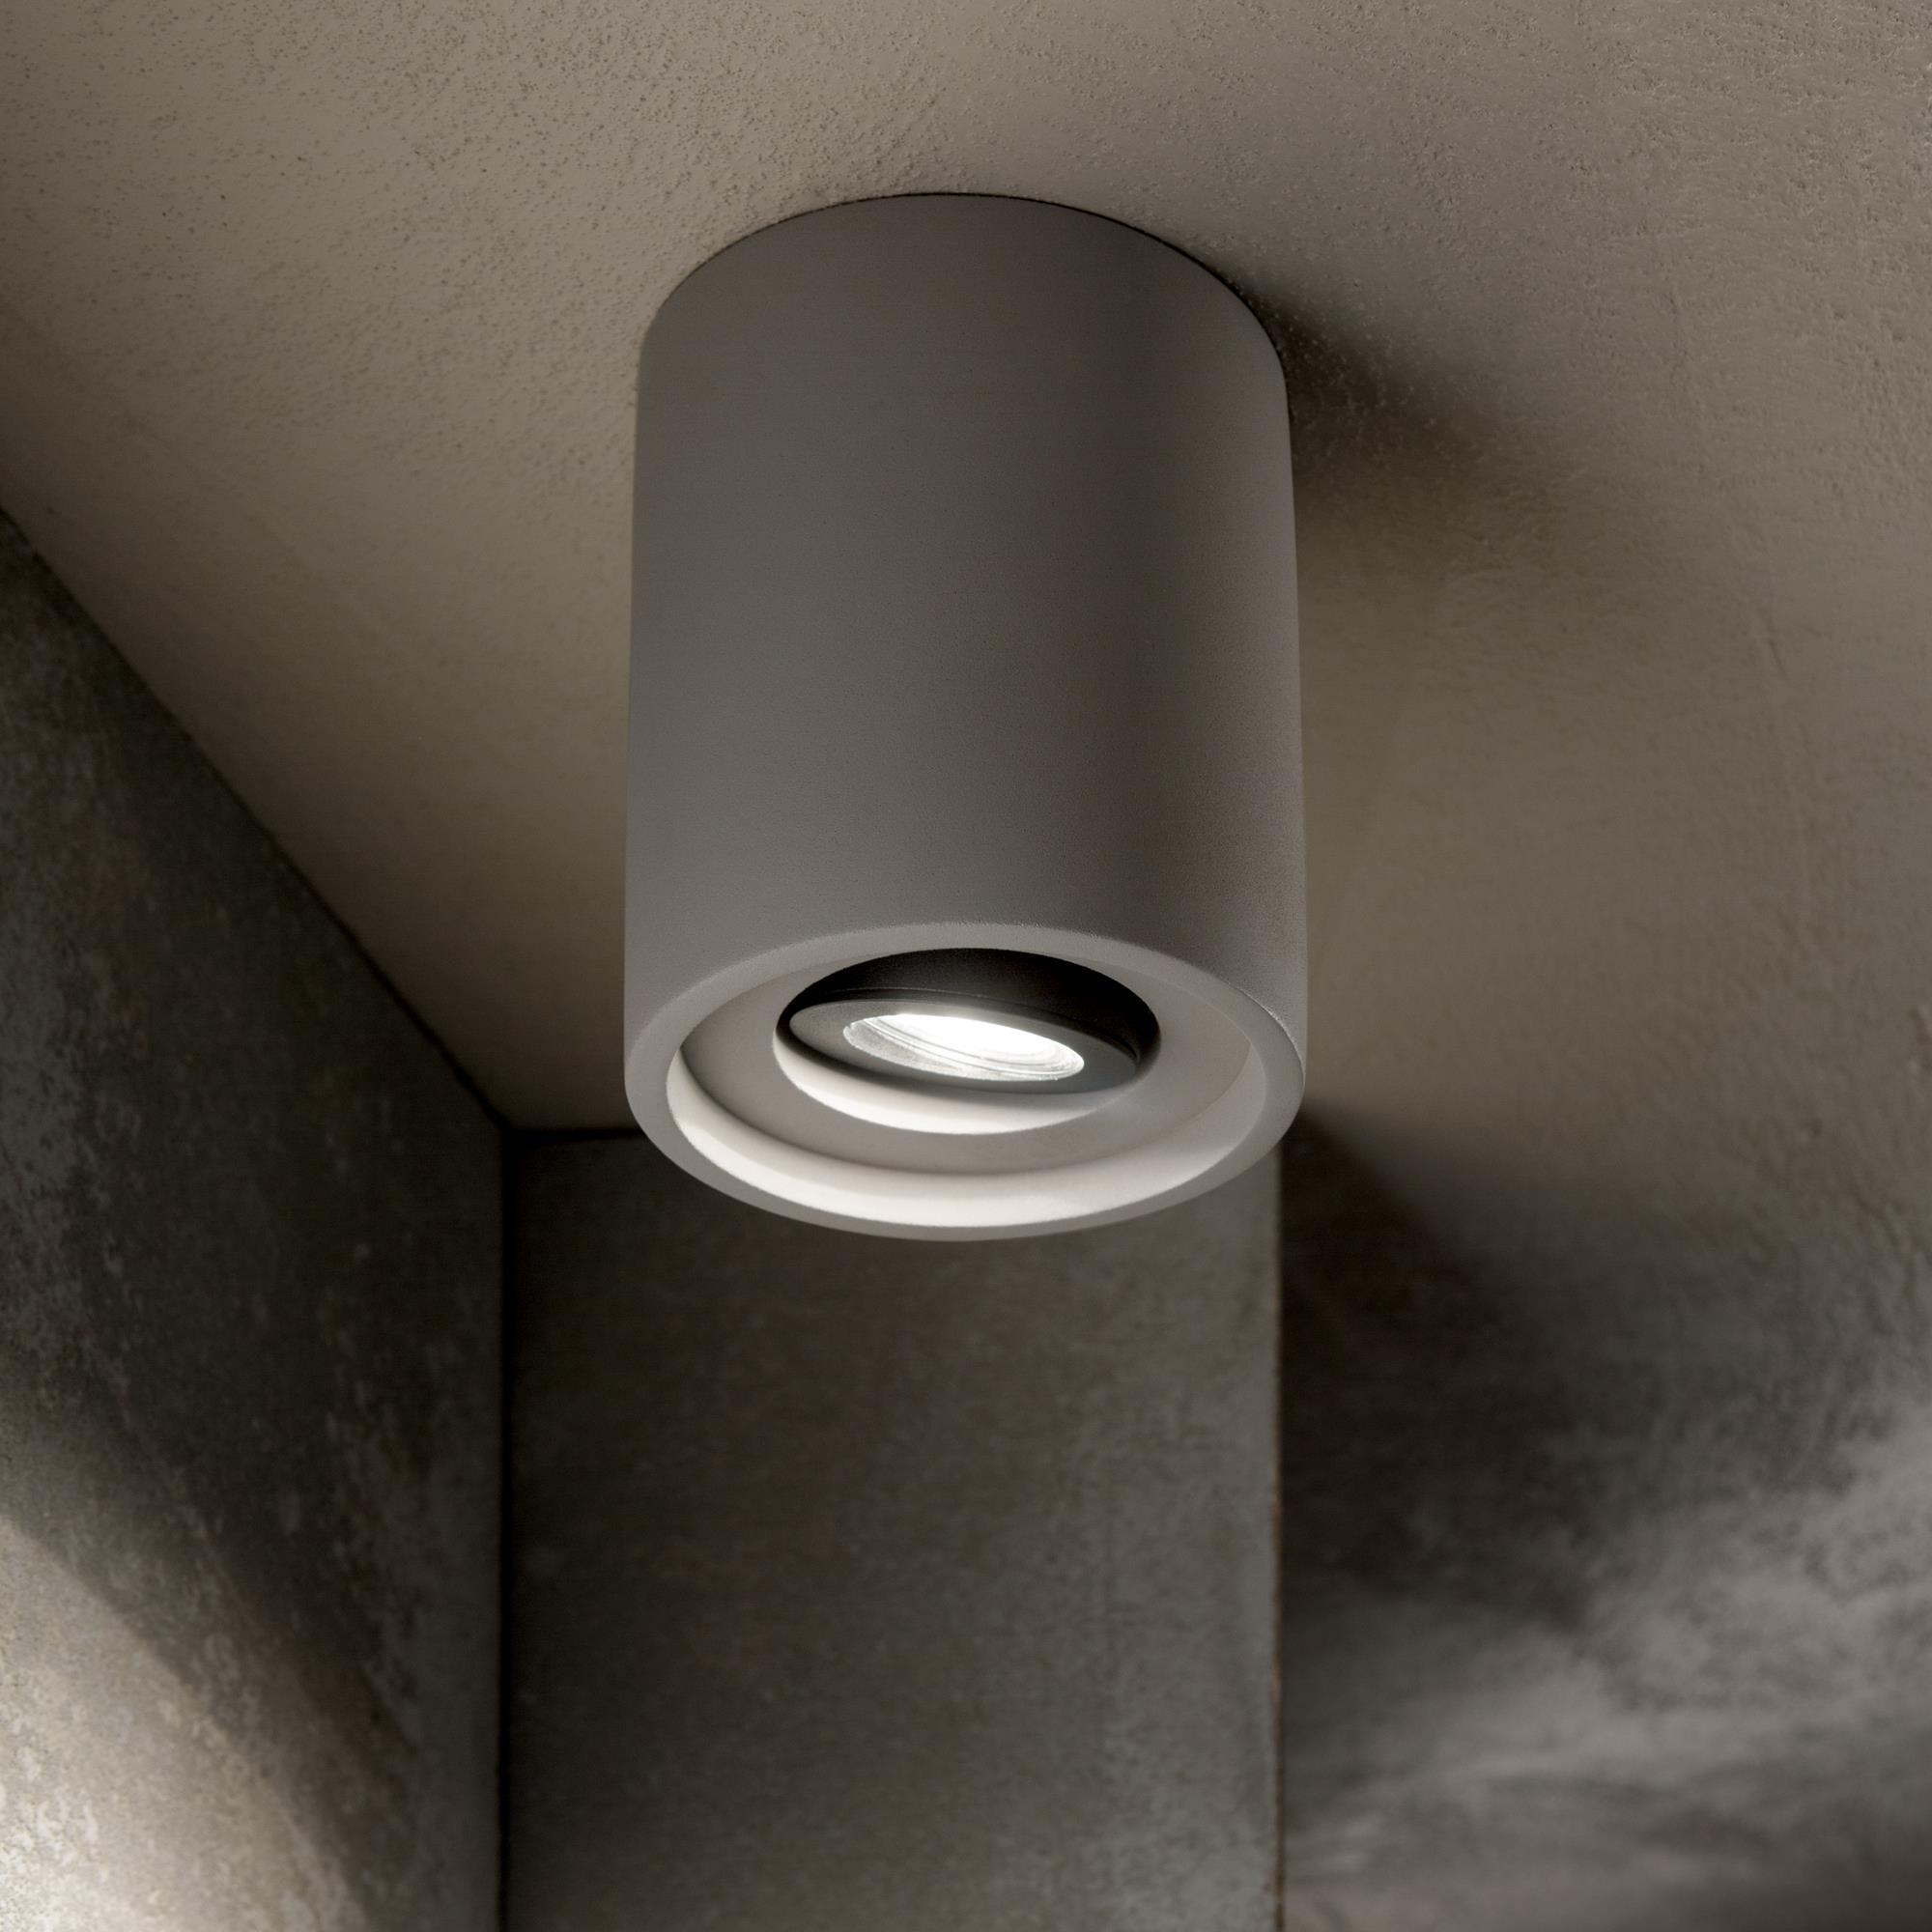 Ideal Lux 150420 OAK PL1 ROUND BIANCO mennyezeti lámpa